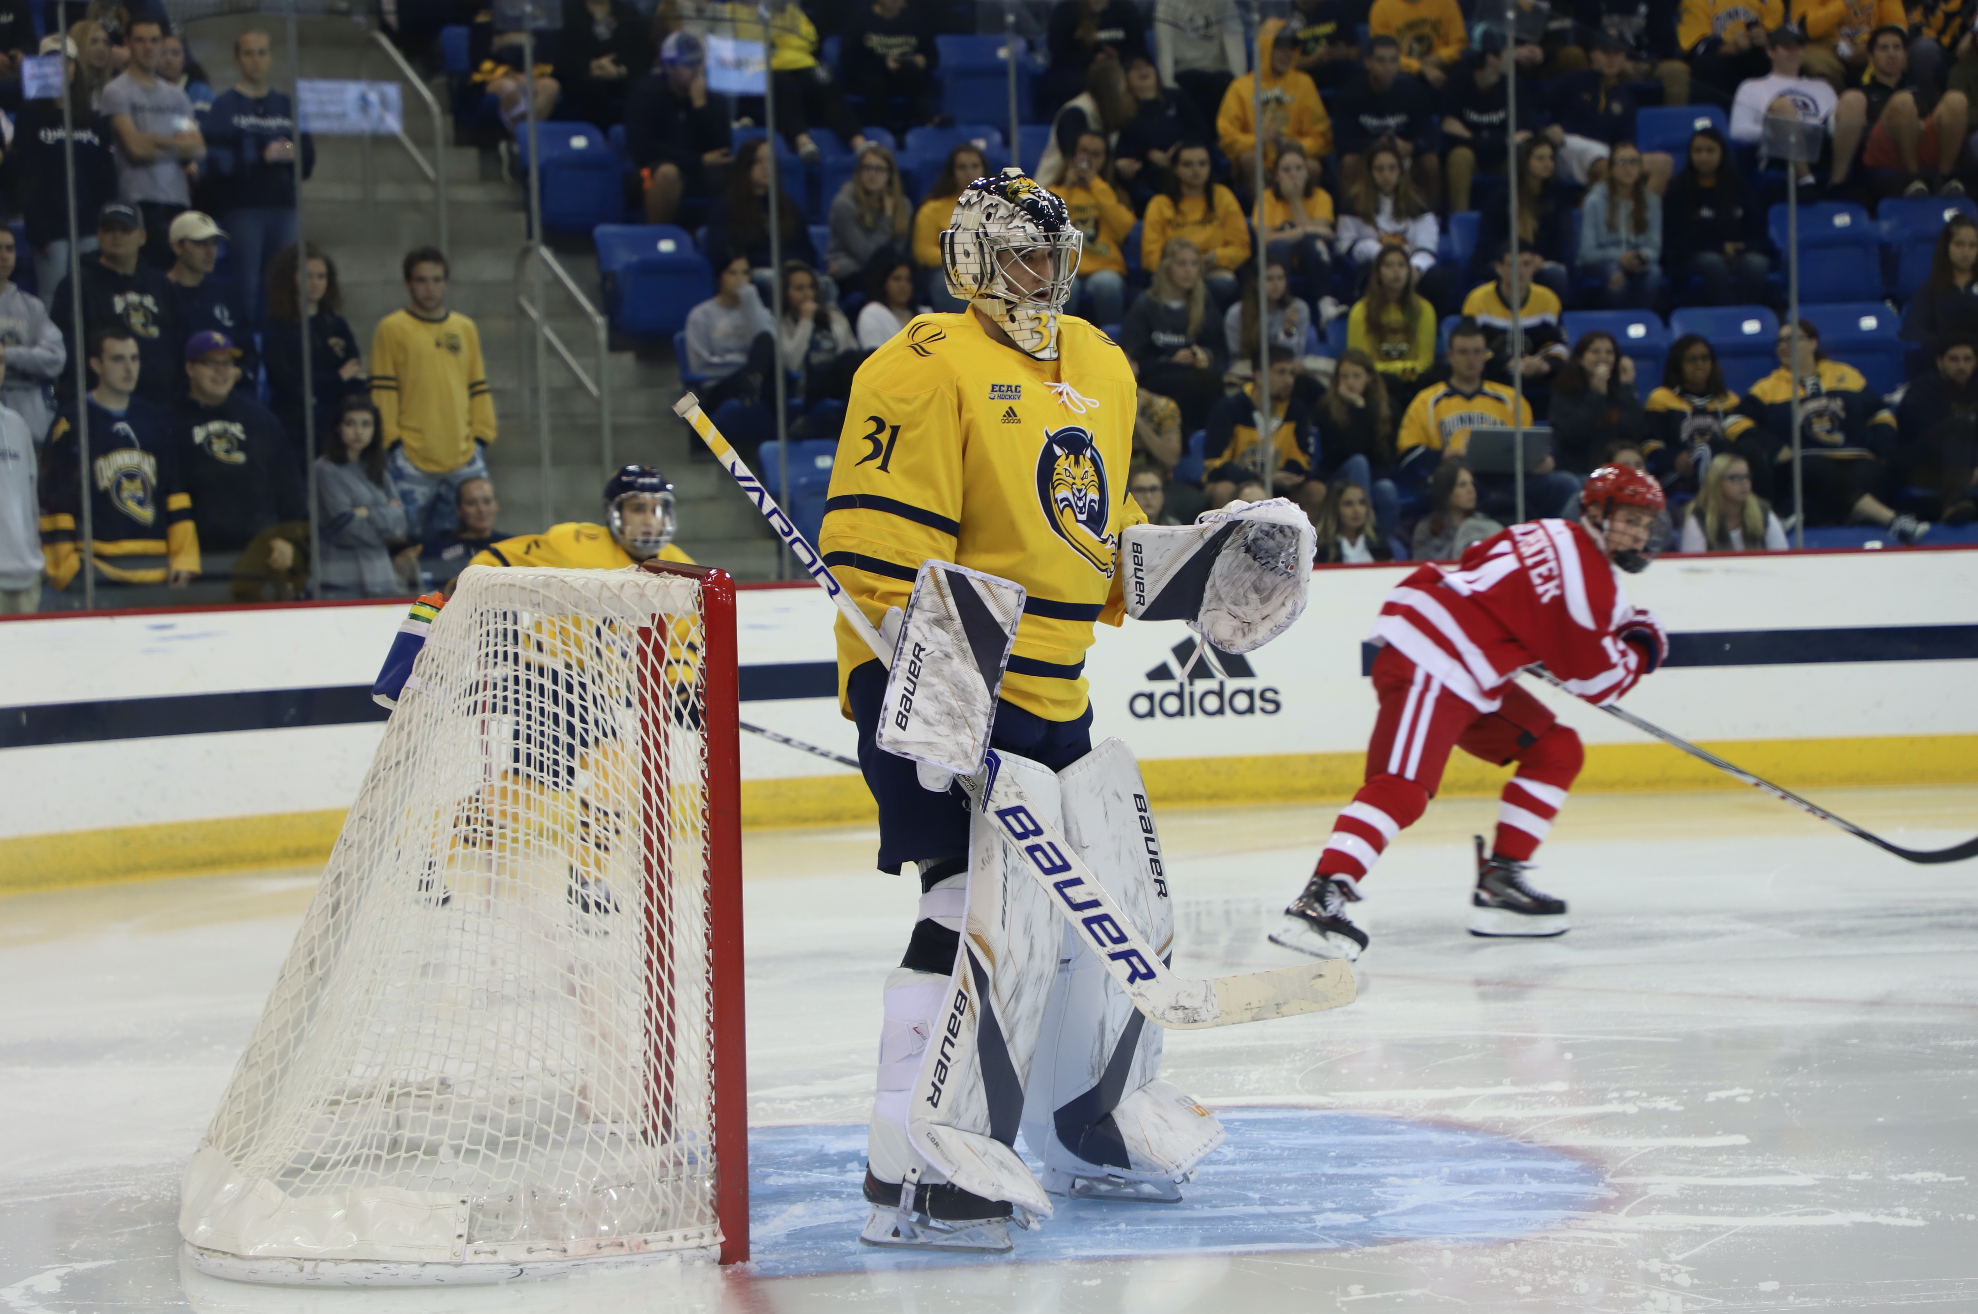 No. 14 Quinnipiac men's ice hockey loses 3-2 in final seconds to No. 2 Boston University